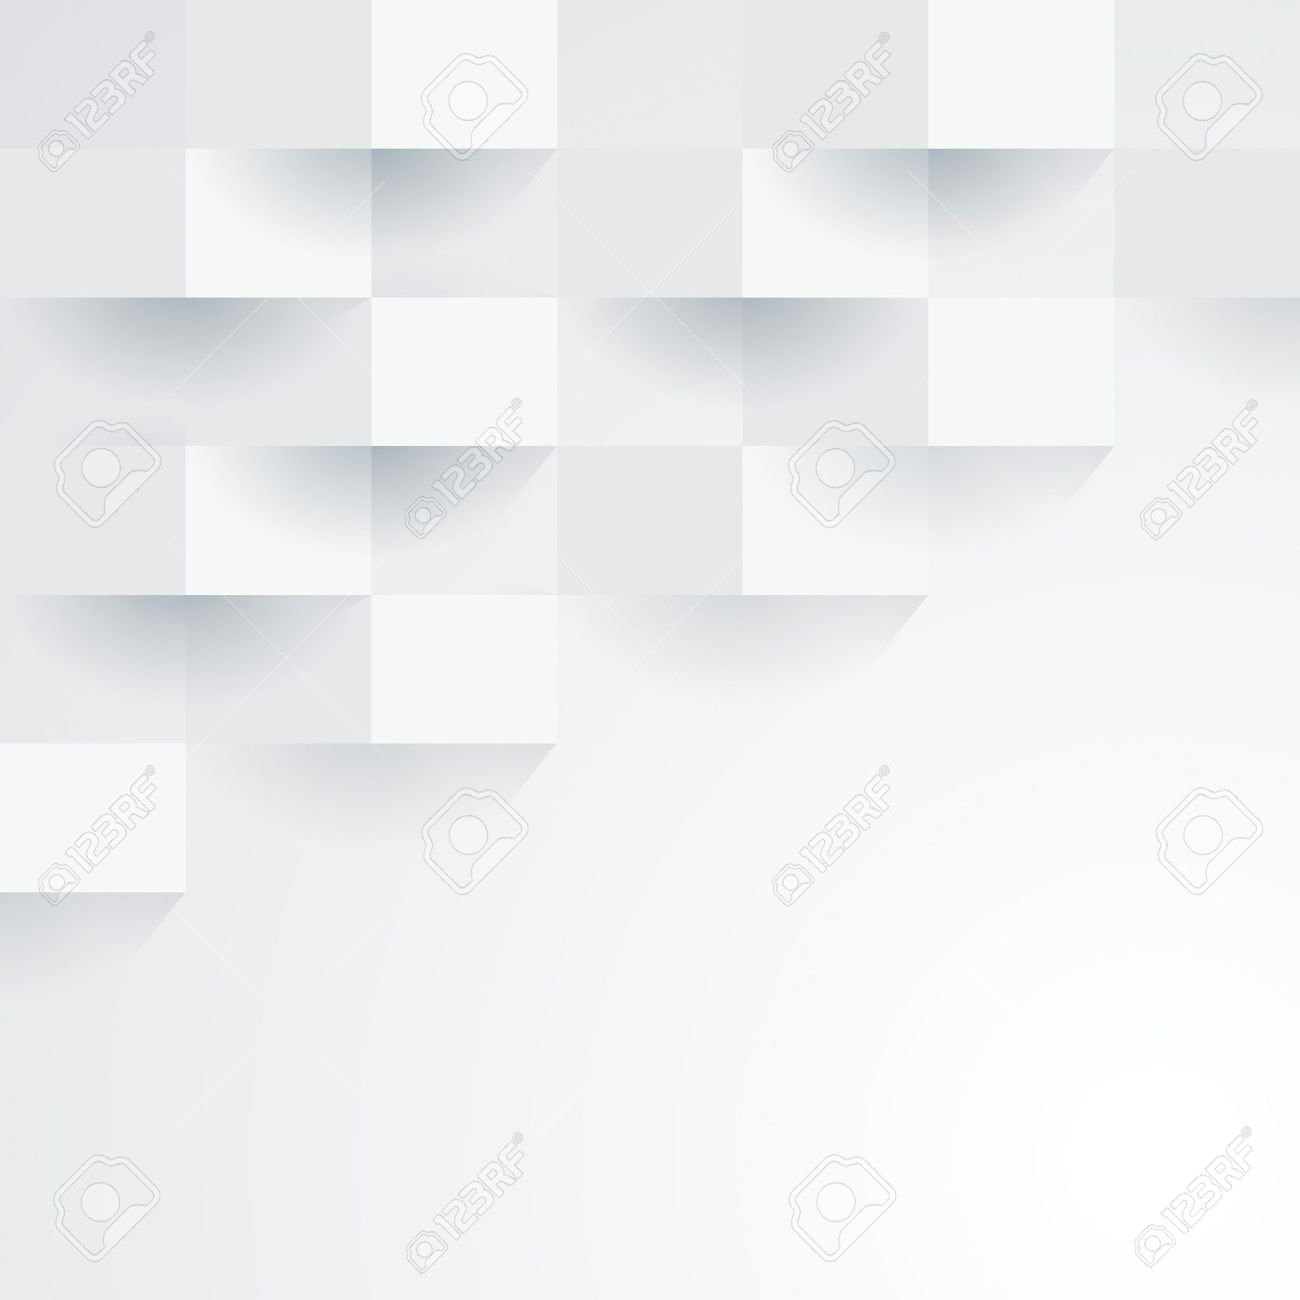 White geometric wallpaper background - 22229001